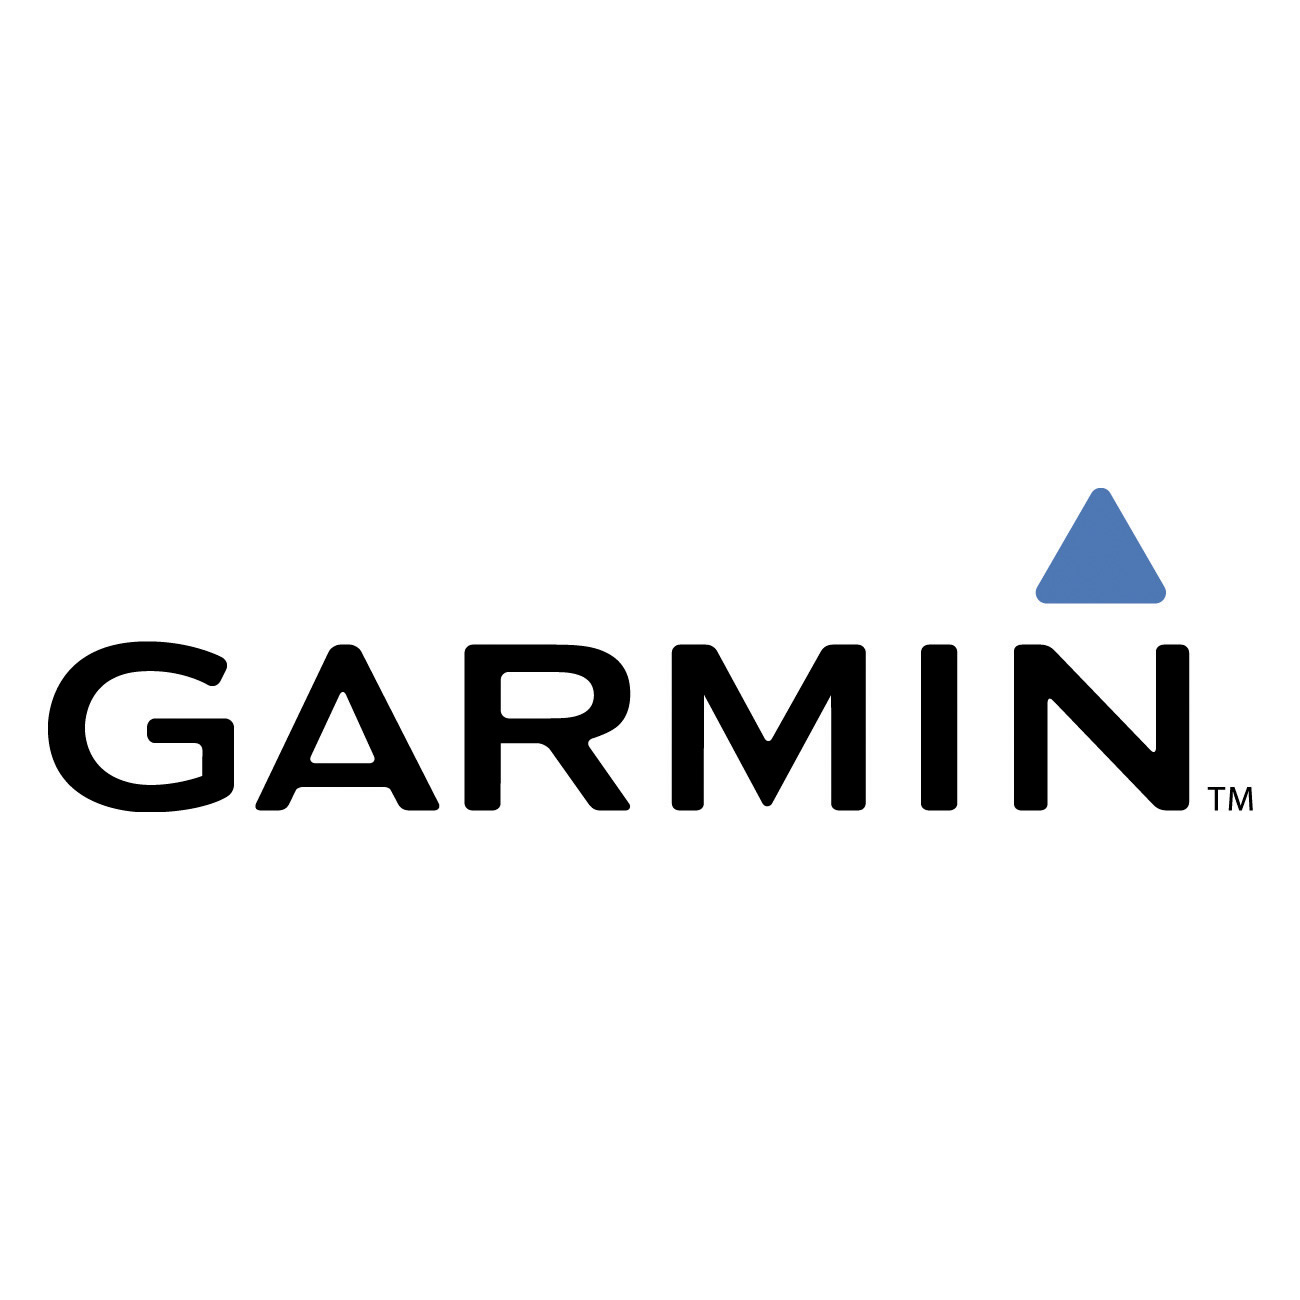 garmin_logo_or.jpg